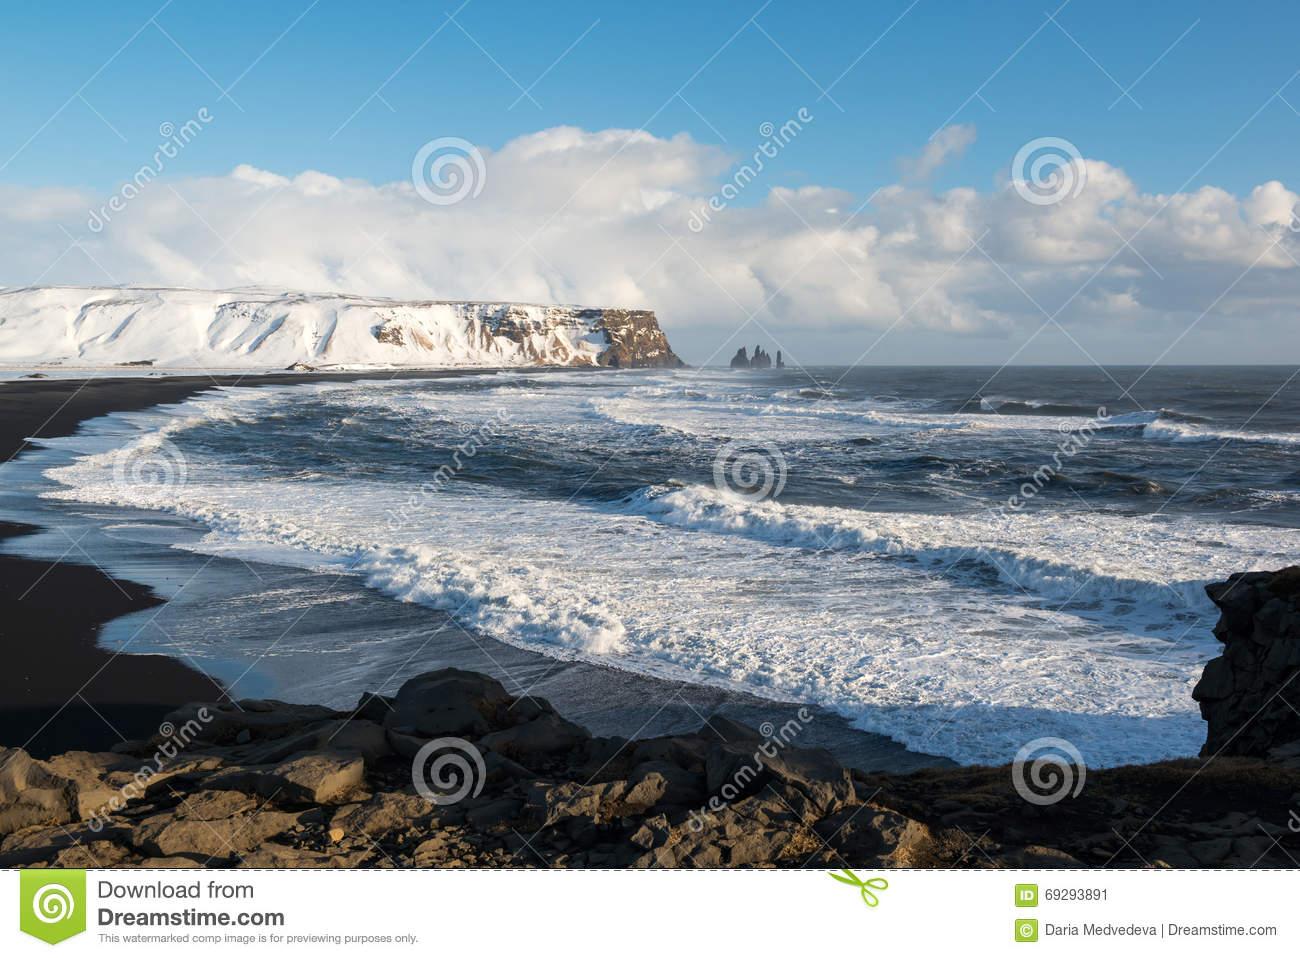 Winter Landscape With Reynisdrangar Stacks, Black Sand Beach And.